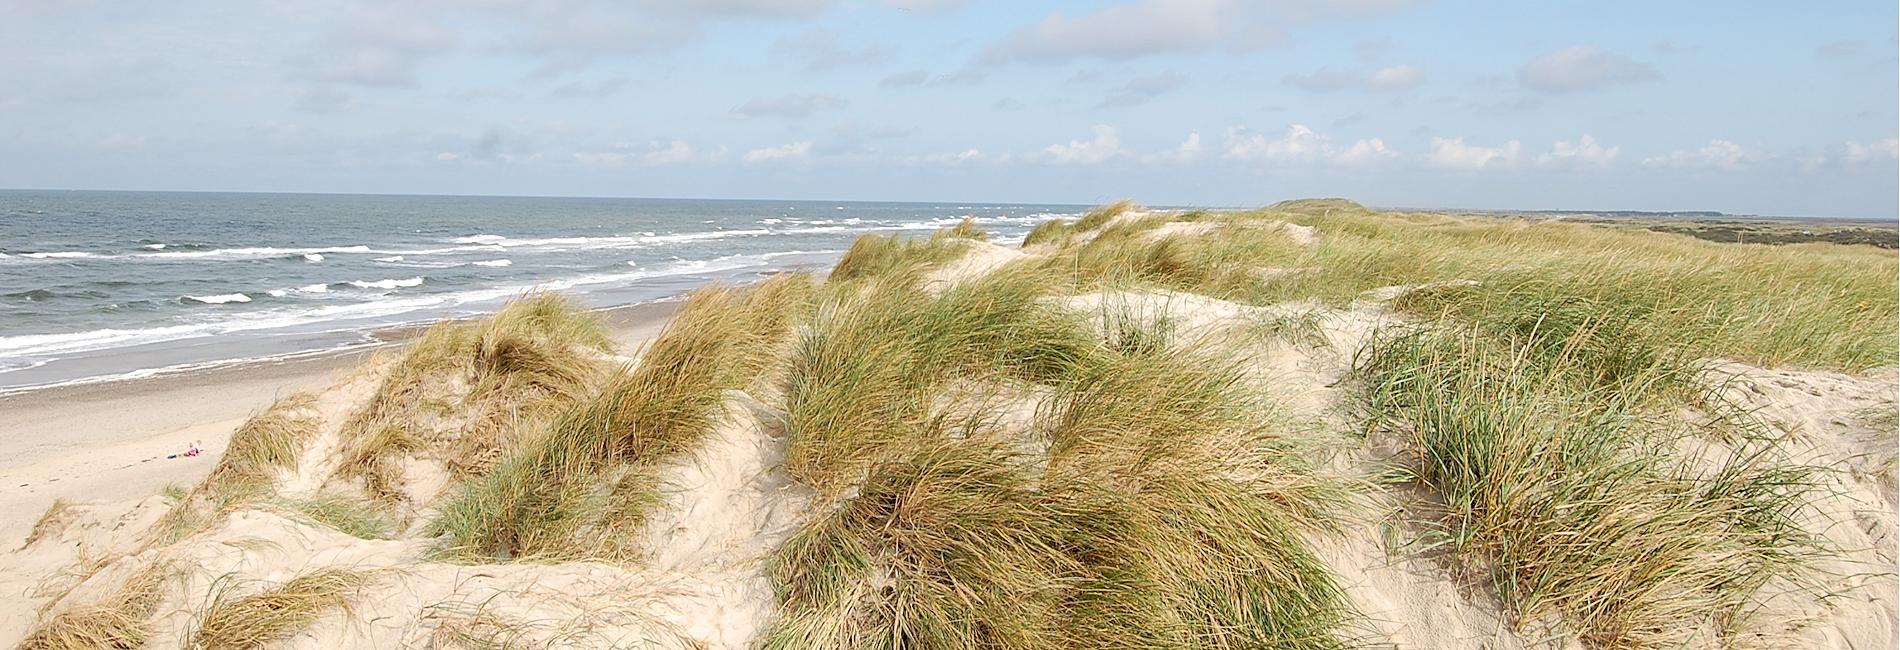 westjuetland nordsee strand duenen